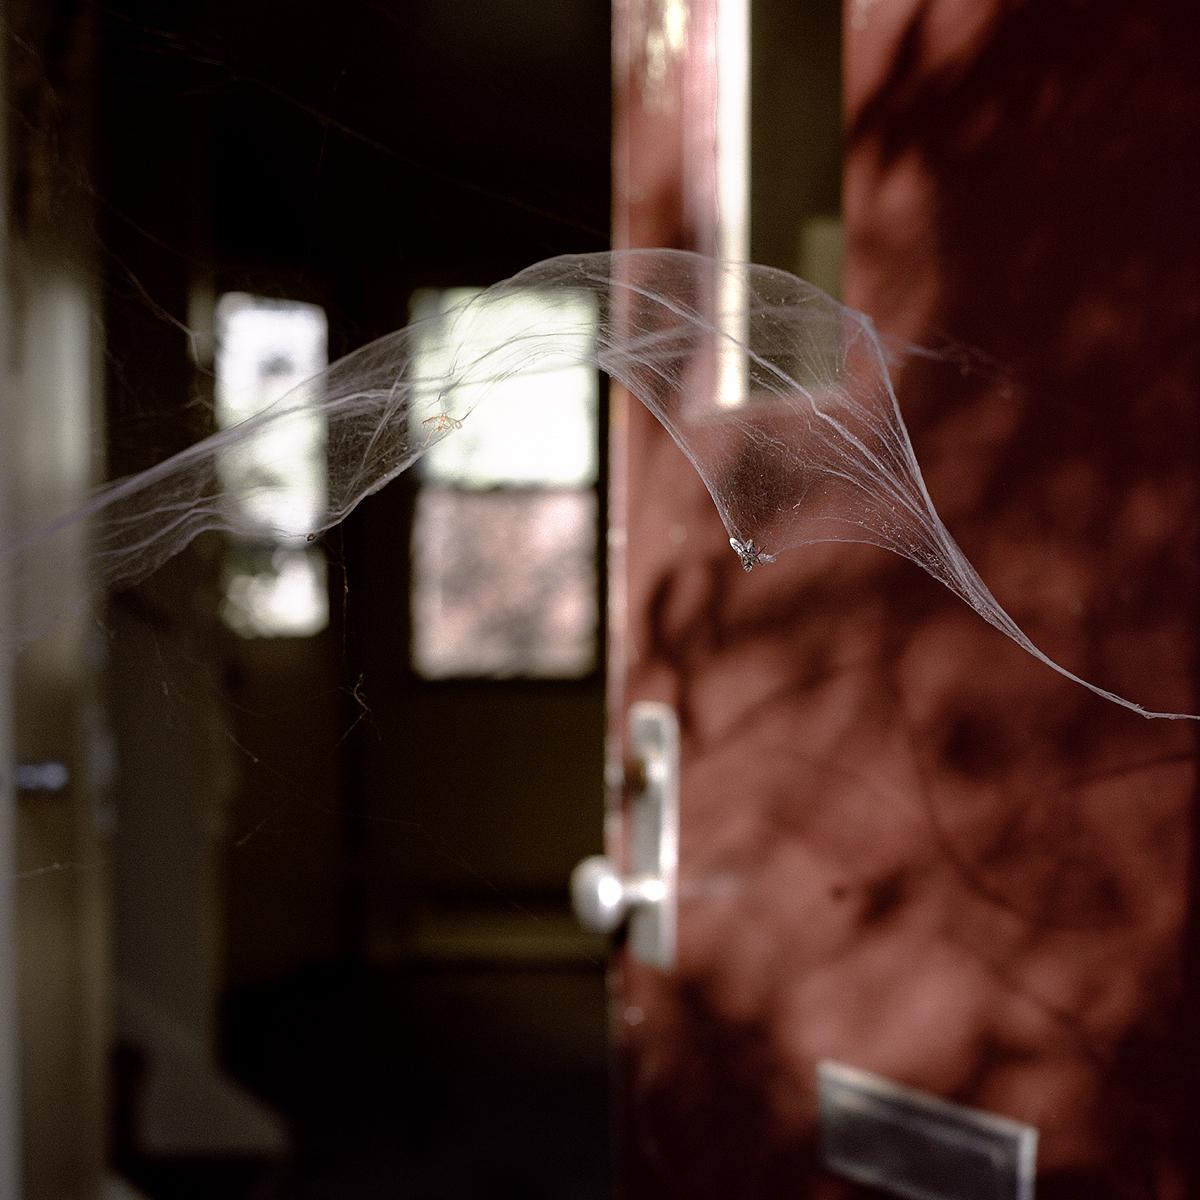 25. Untitled (Cobweb). 2005. Archival Pigment Print.